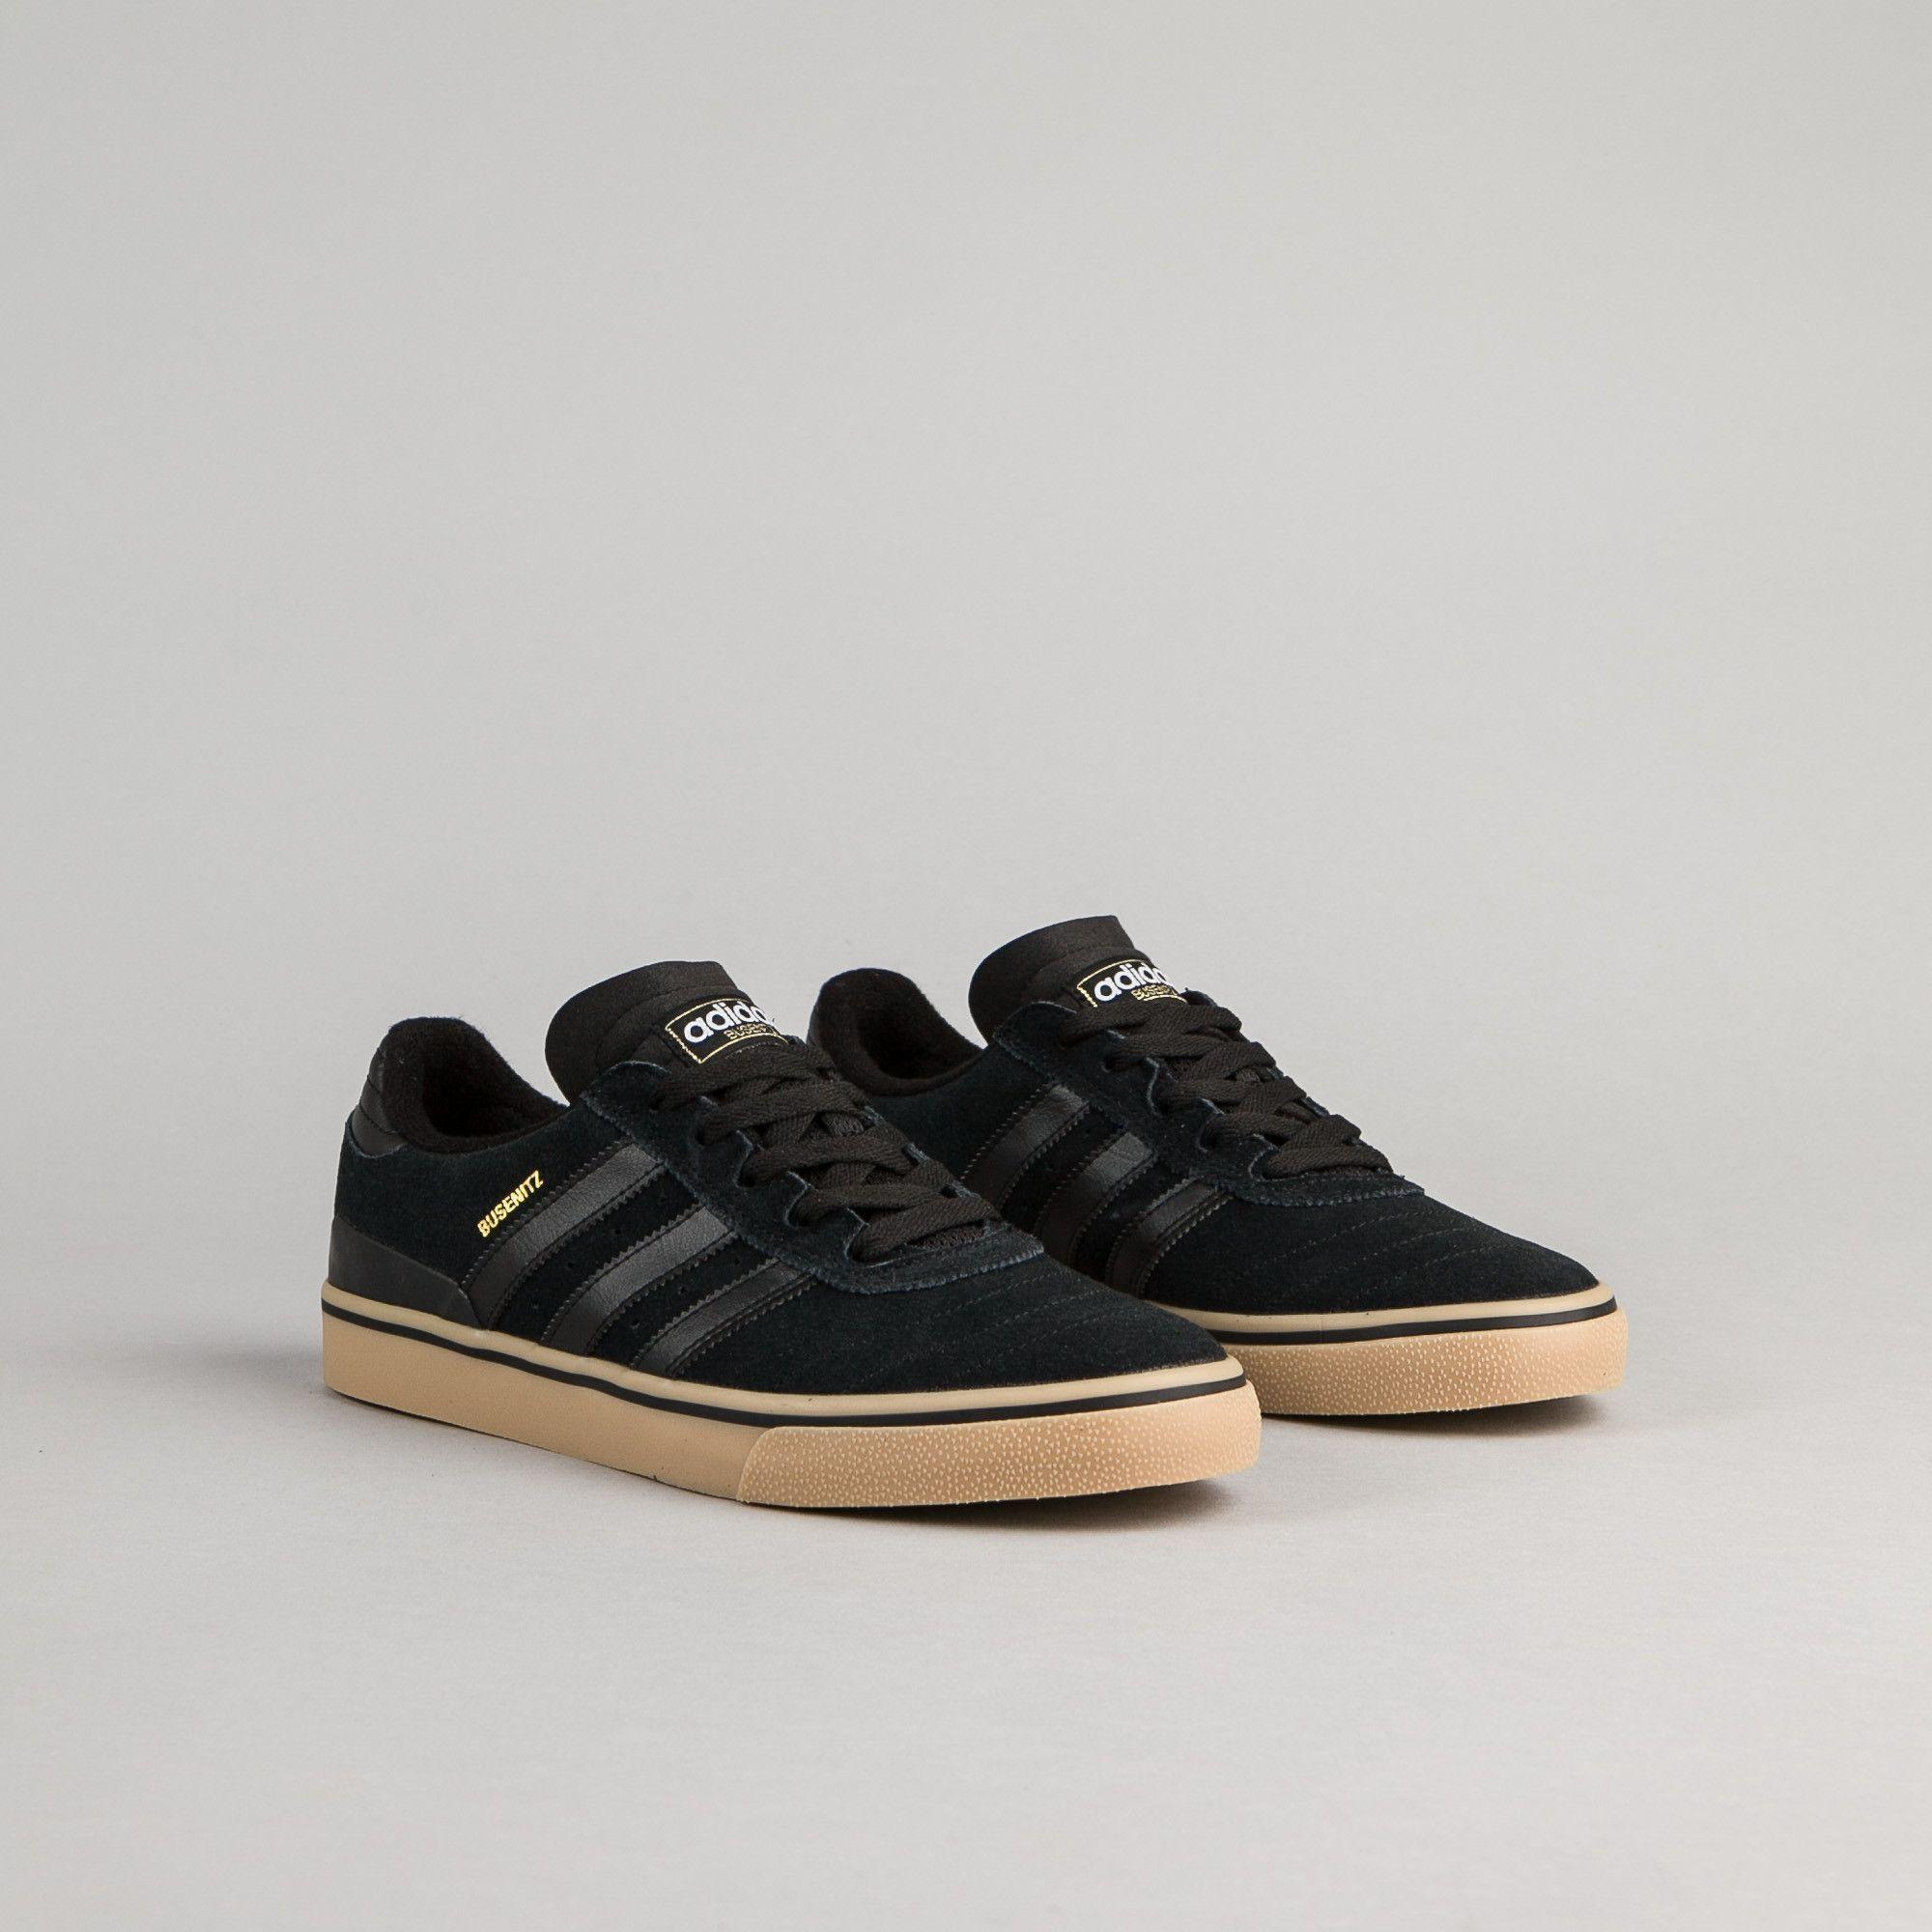 Neue Stile adidas Skateboarding Busenitz Vulc ADV Schuhe